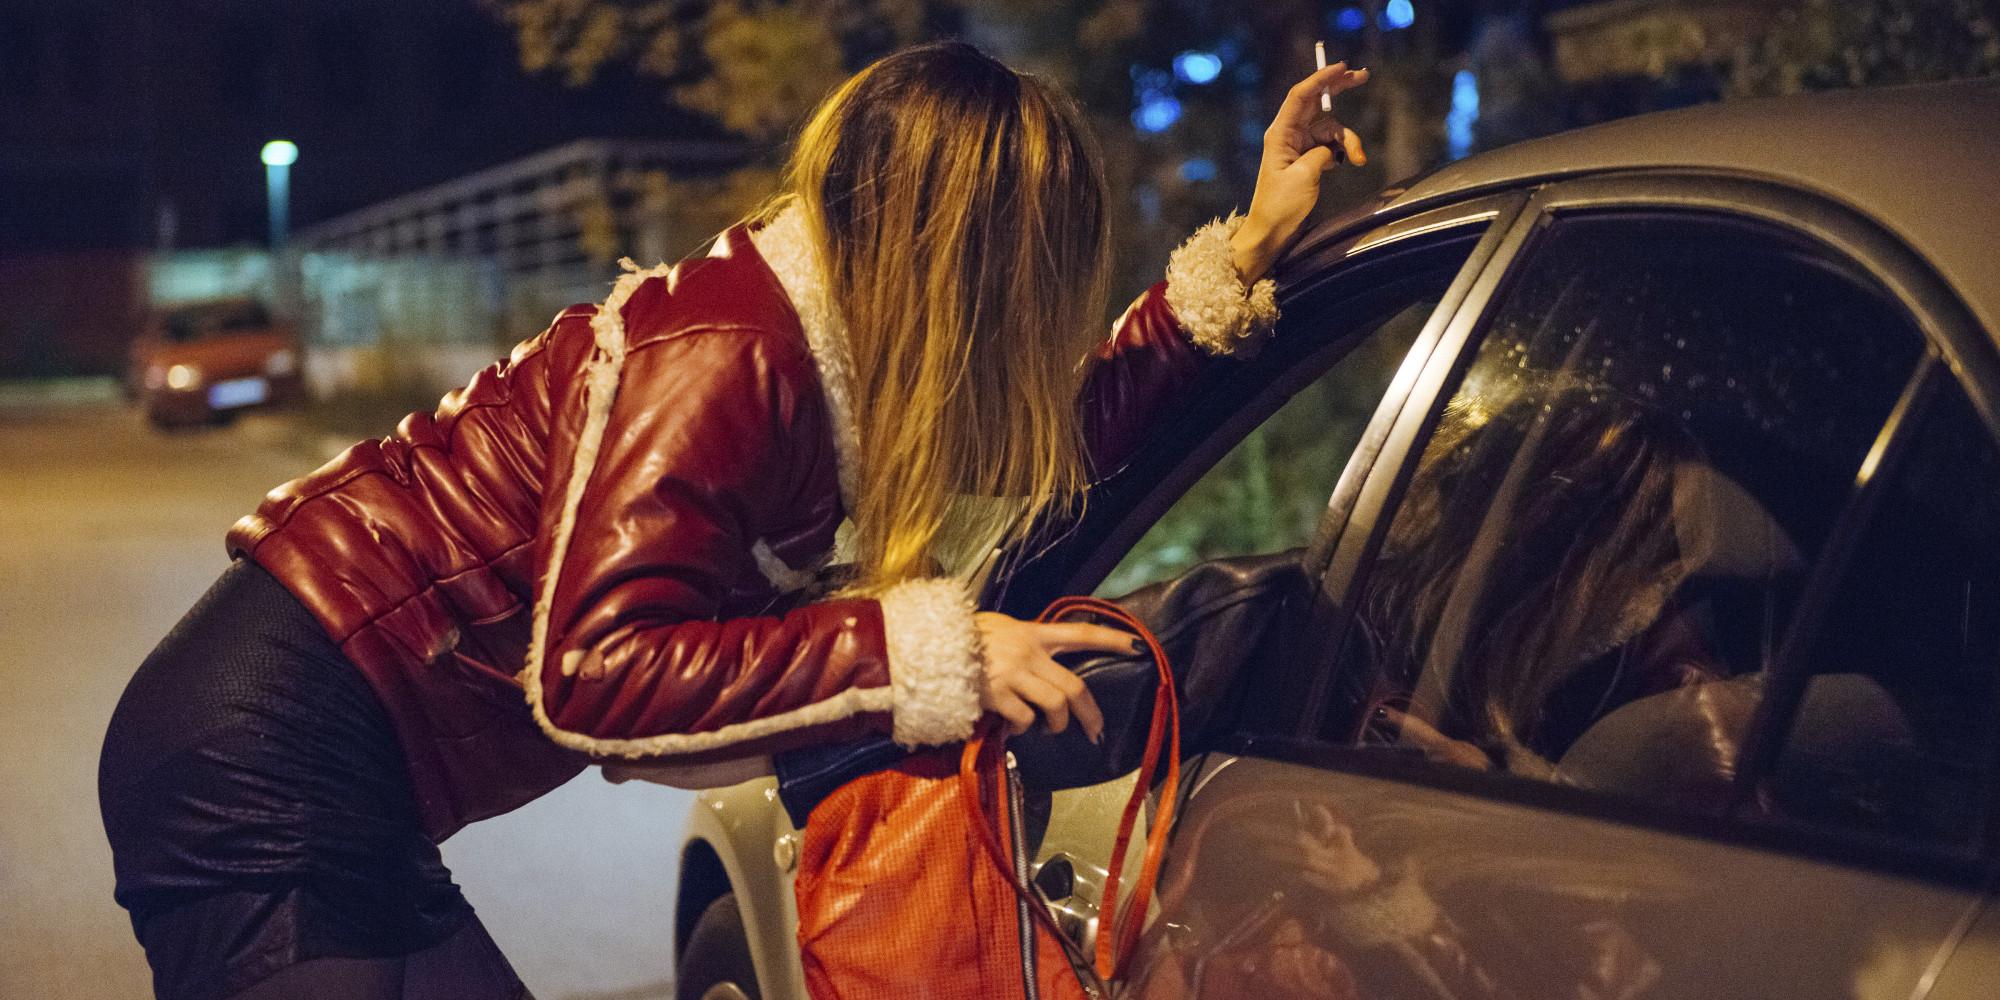 Prostituées ugorod photo des profils